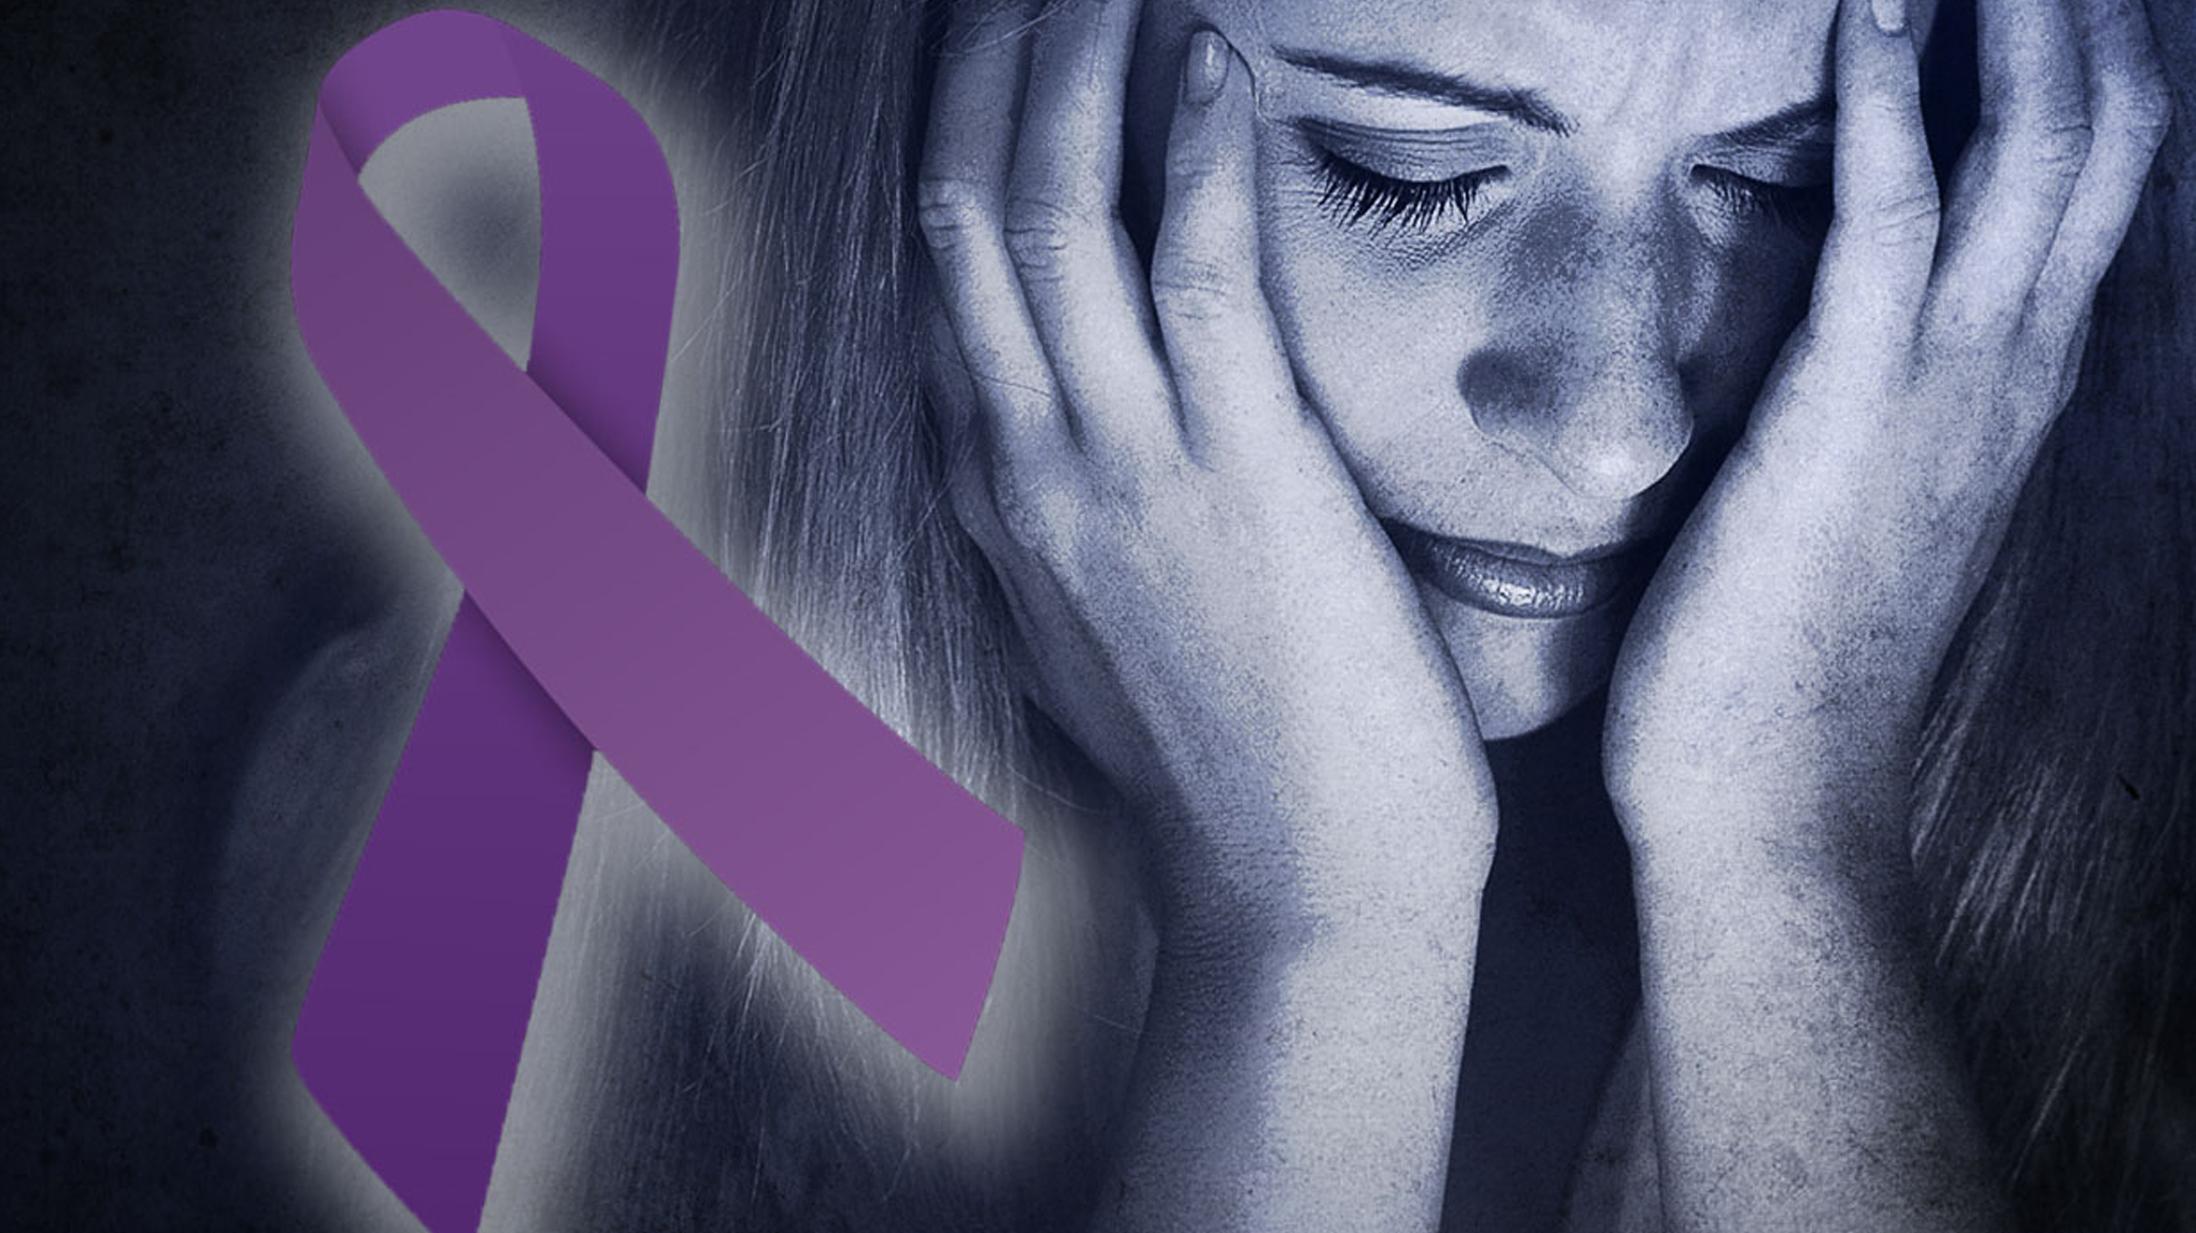 Domestic Violence 10242015_1445740685912.jpg